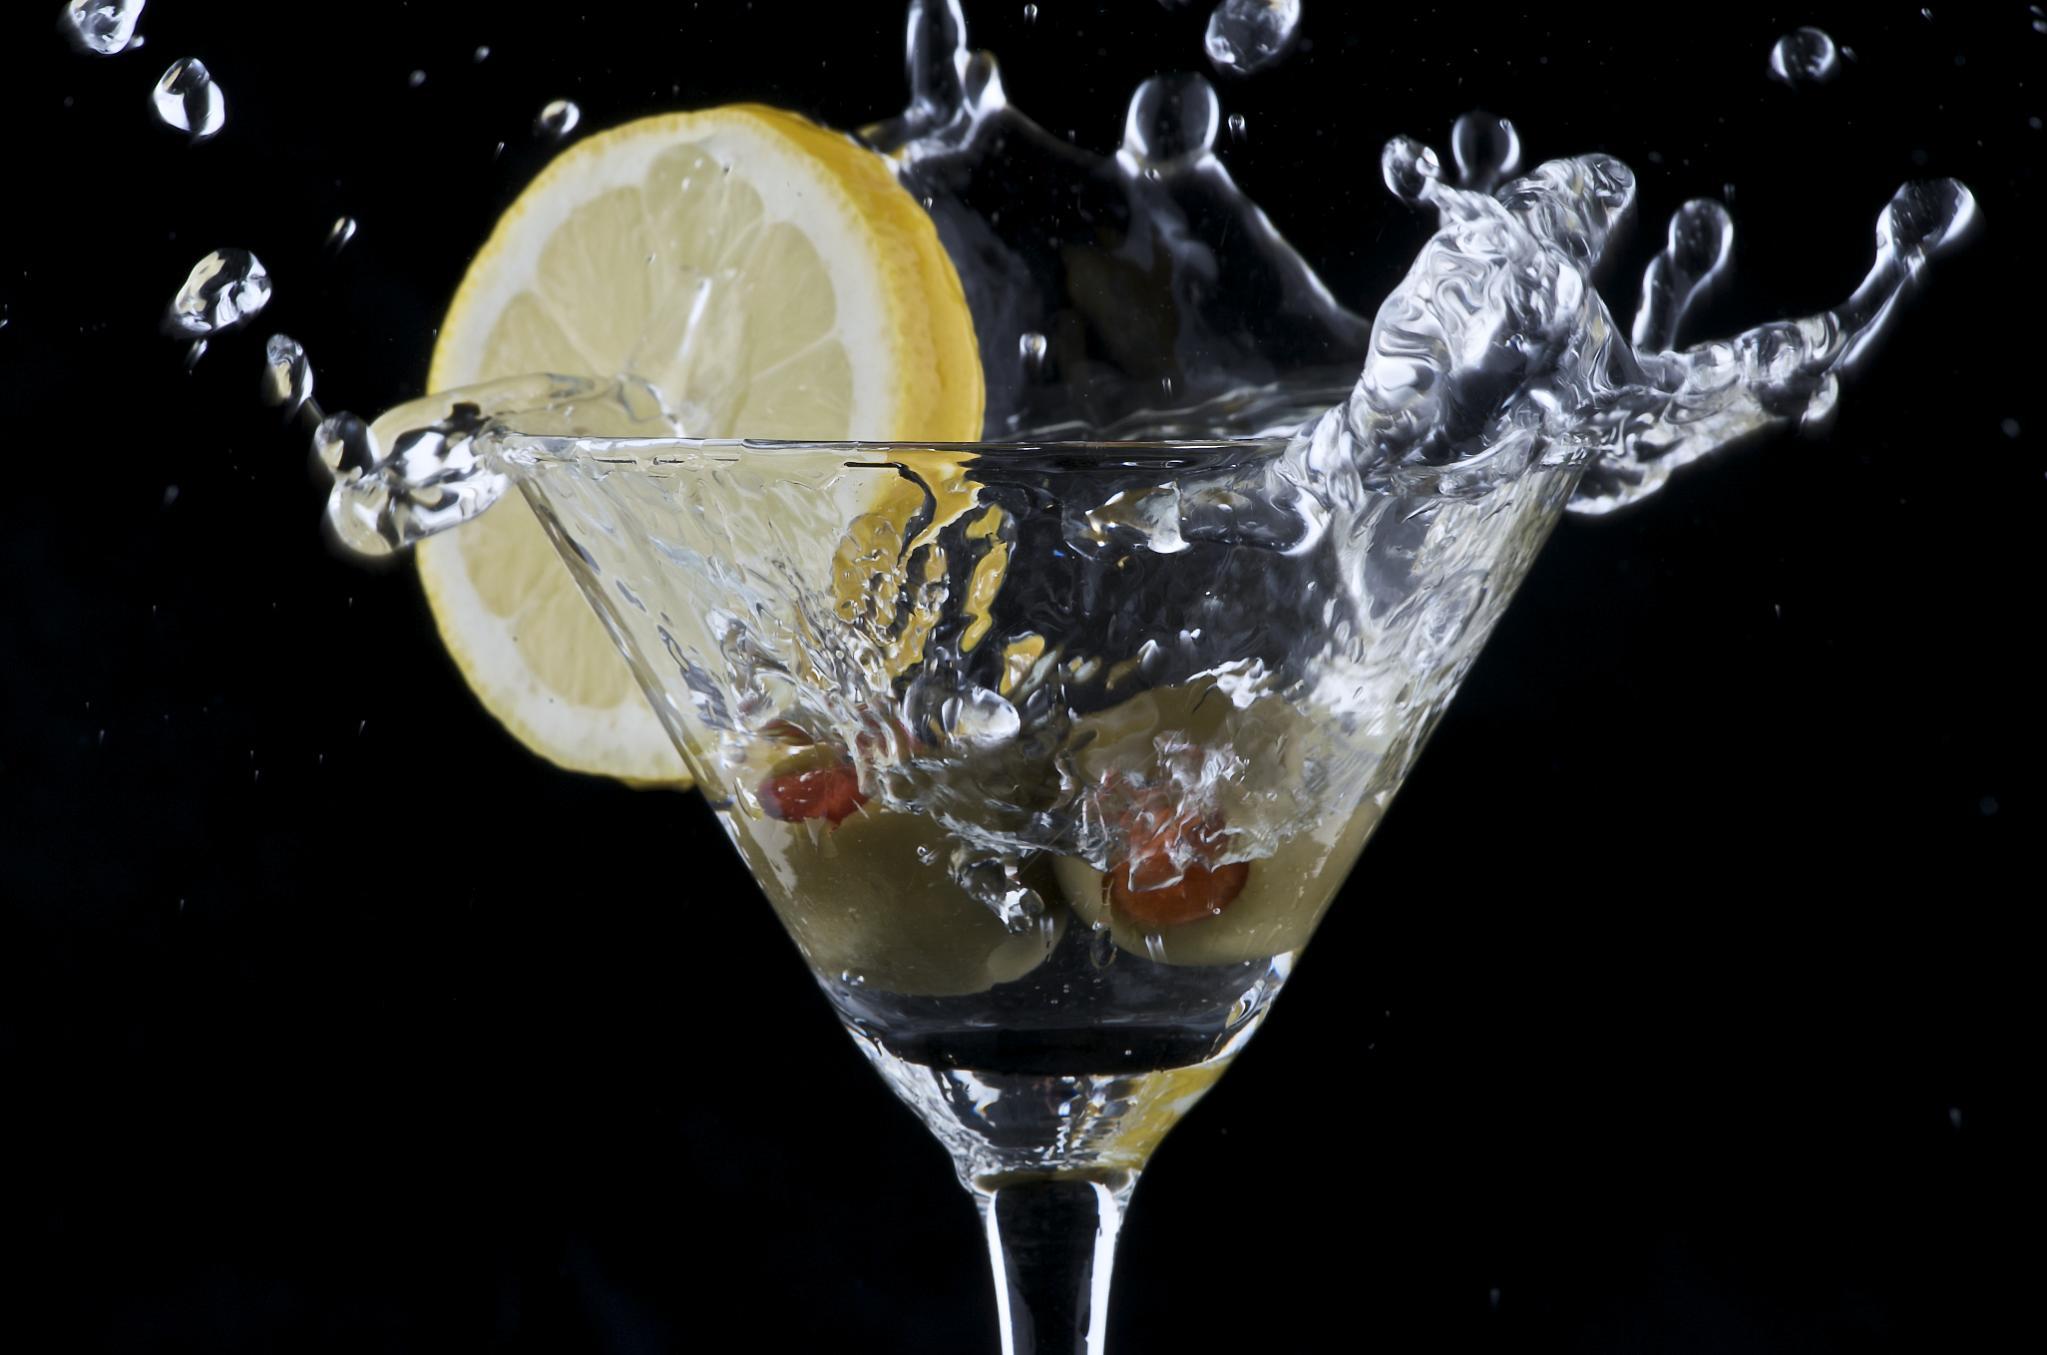 make me a drink - photo #21